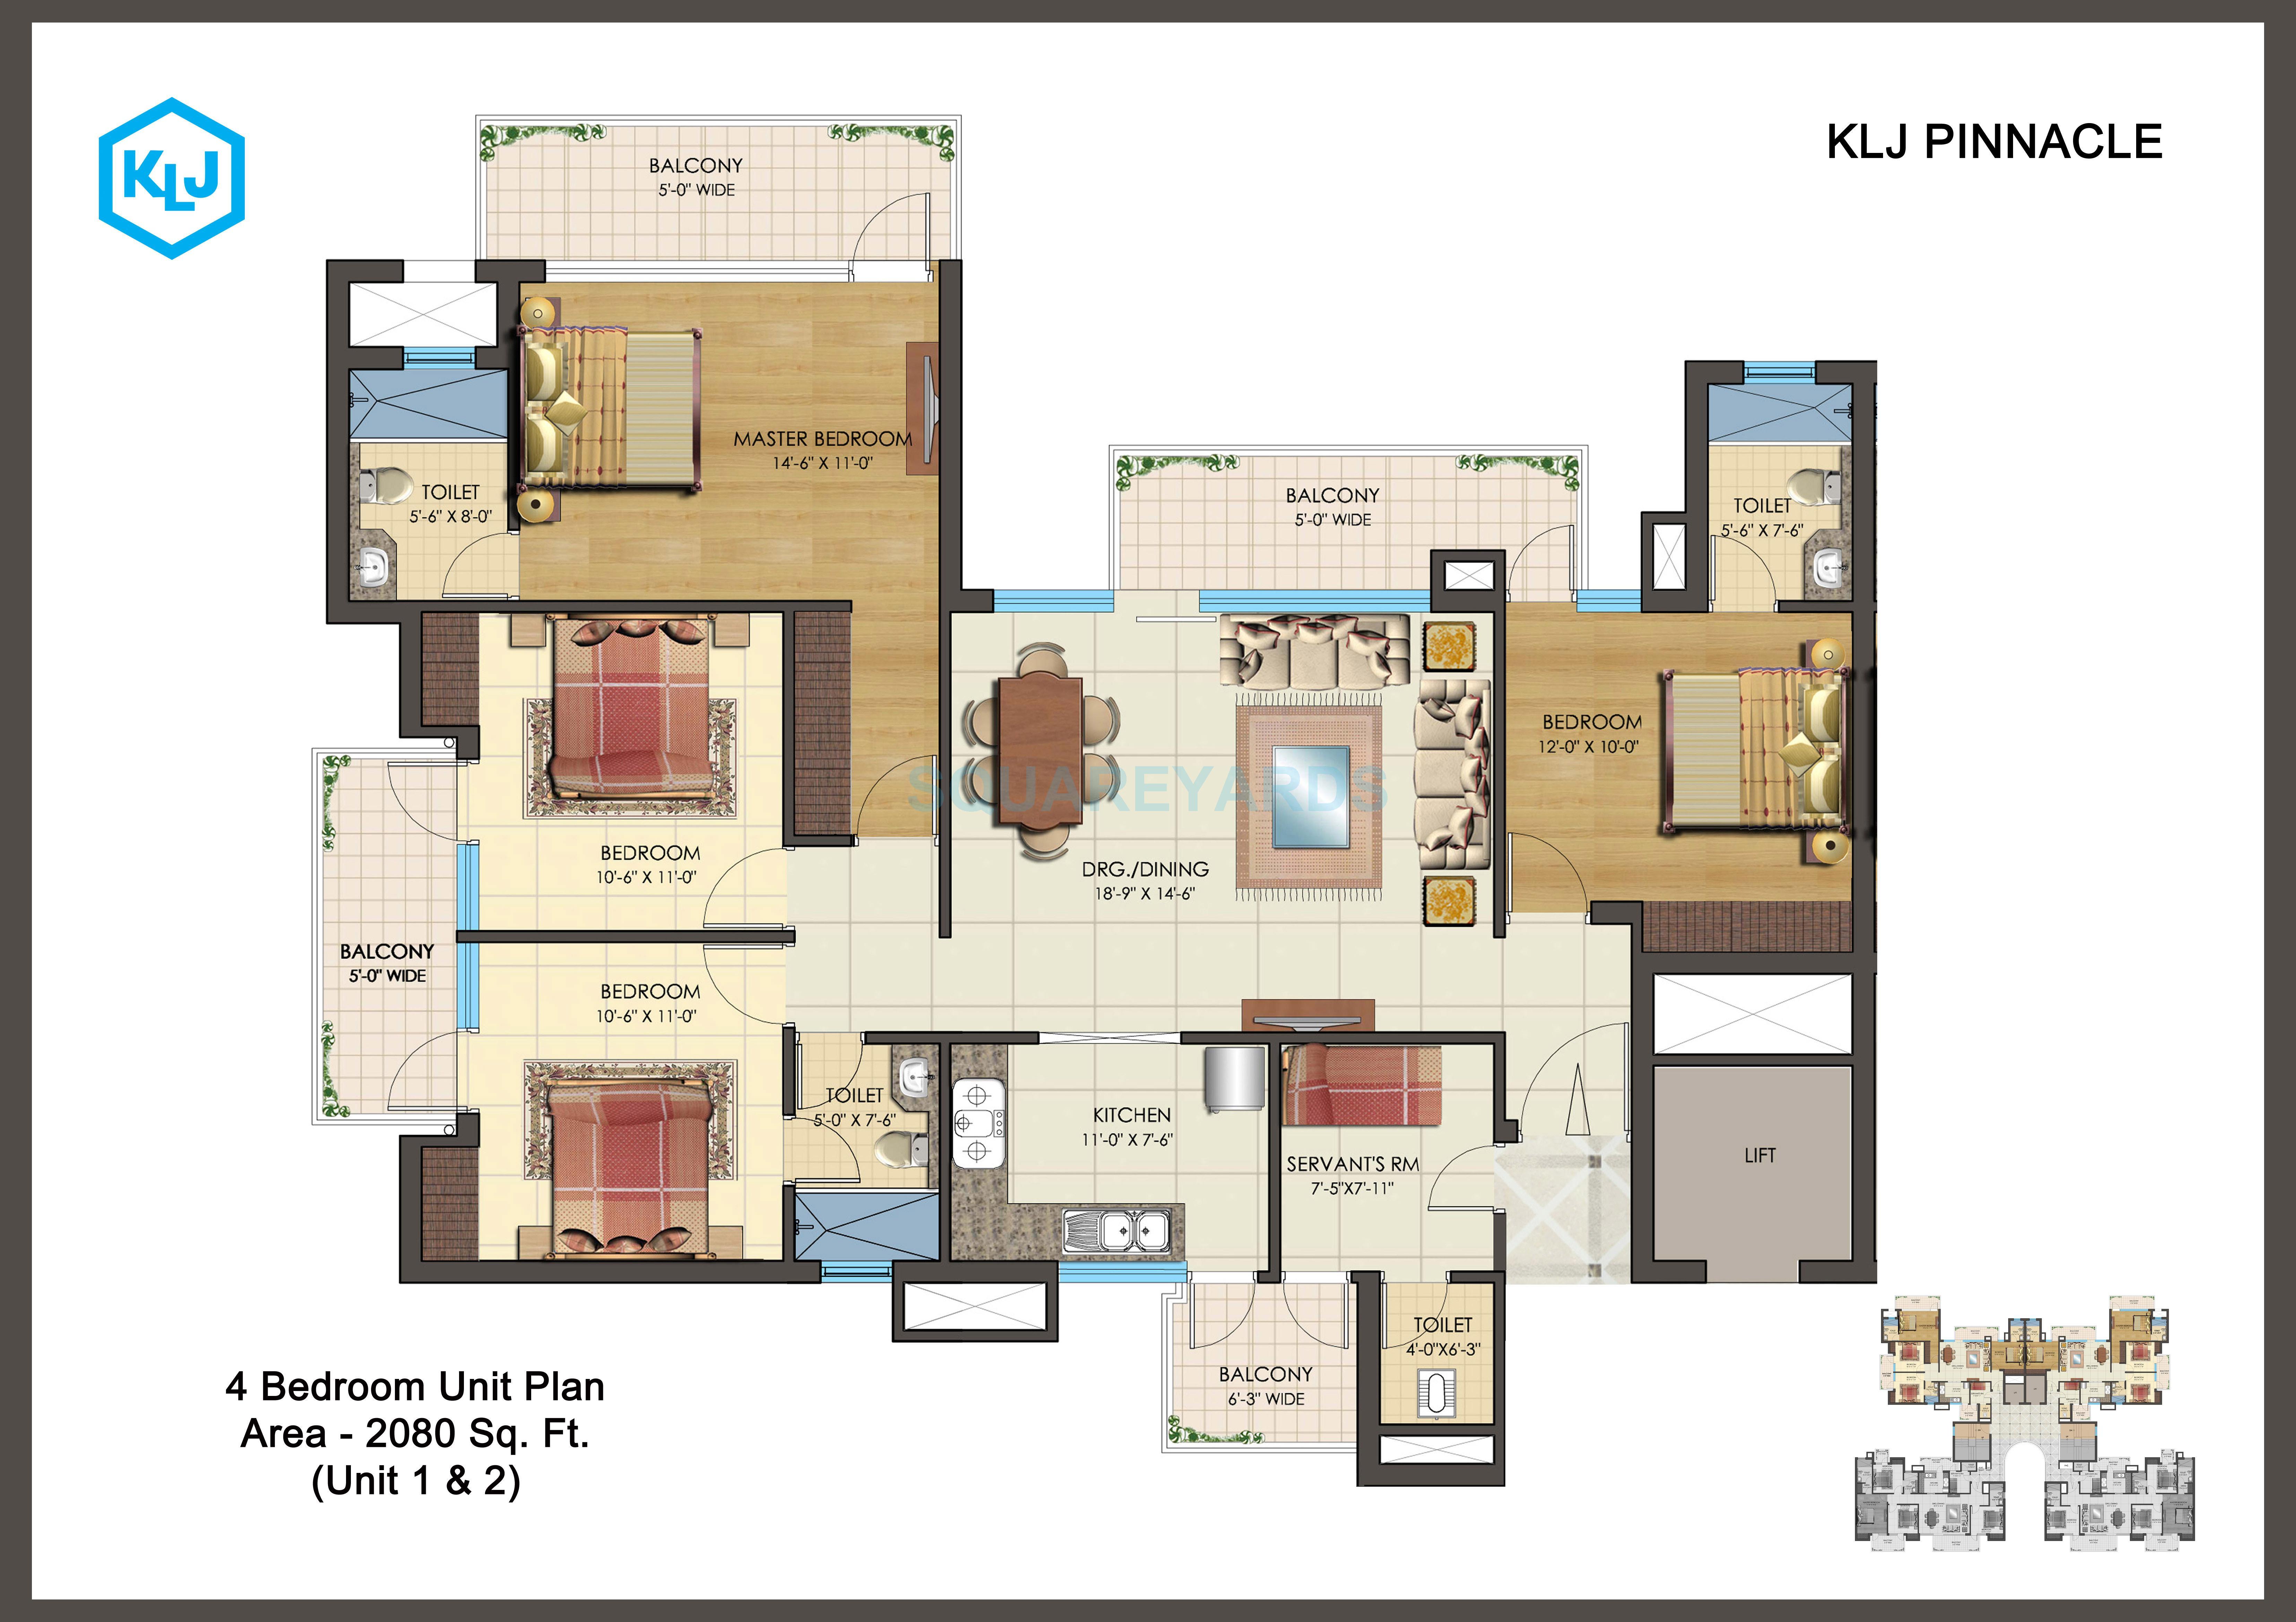 klj pinnacle apartment 4bhk 2080sqft 1